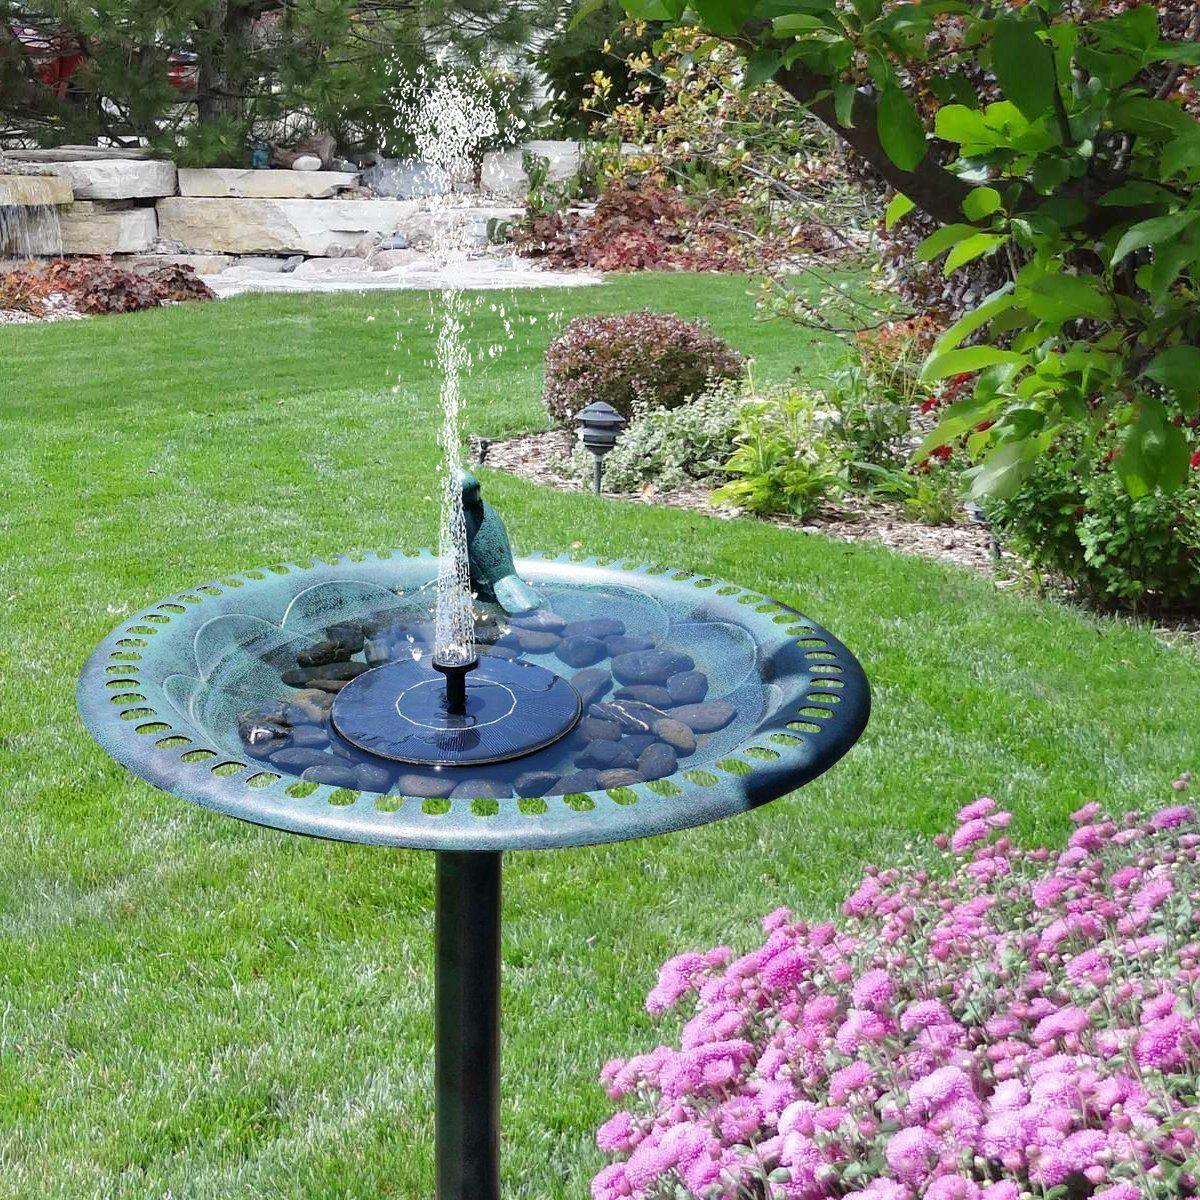 Solar Powered Bird Bath Fountain Pump Outdoor Watering Submersible ...